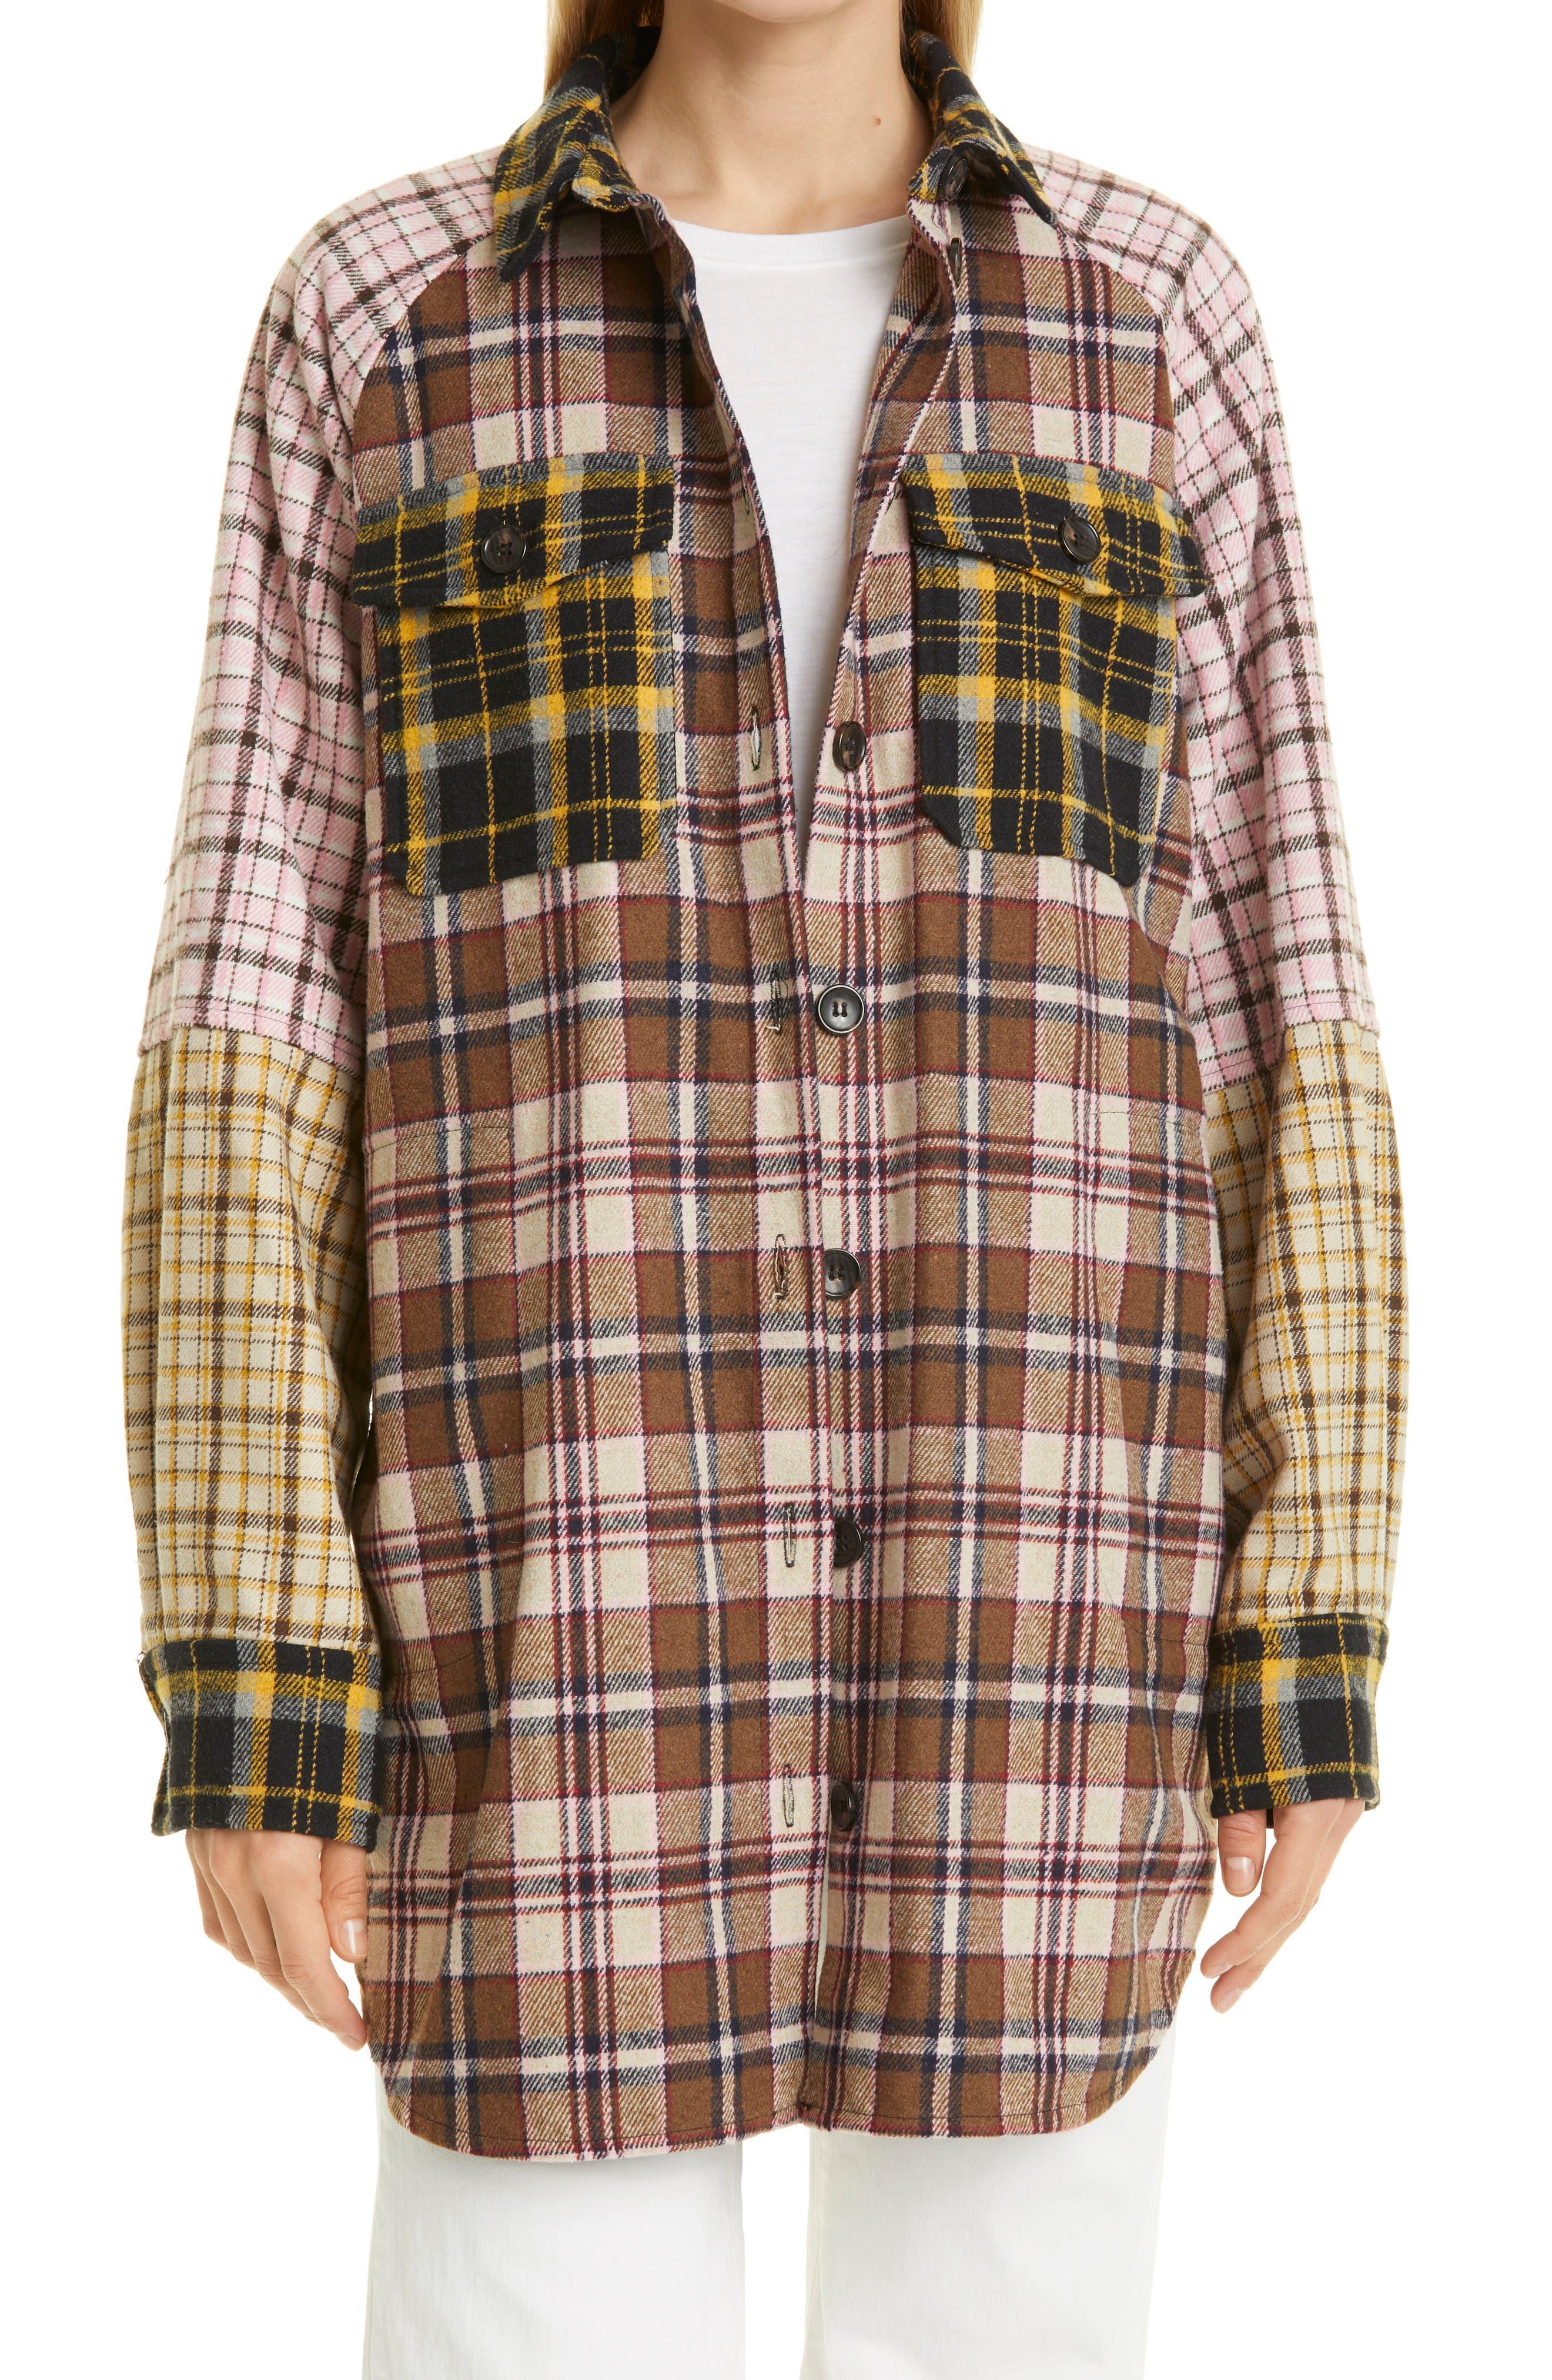 Pechelo Mixed Check Flannel Shirt